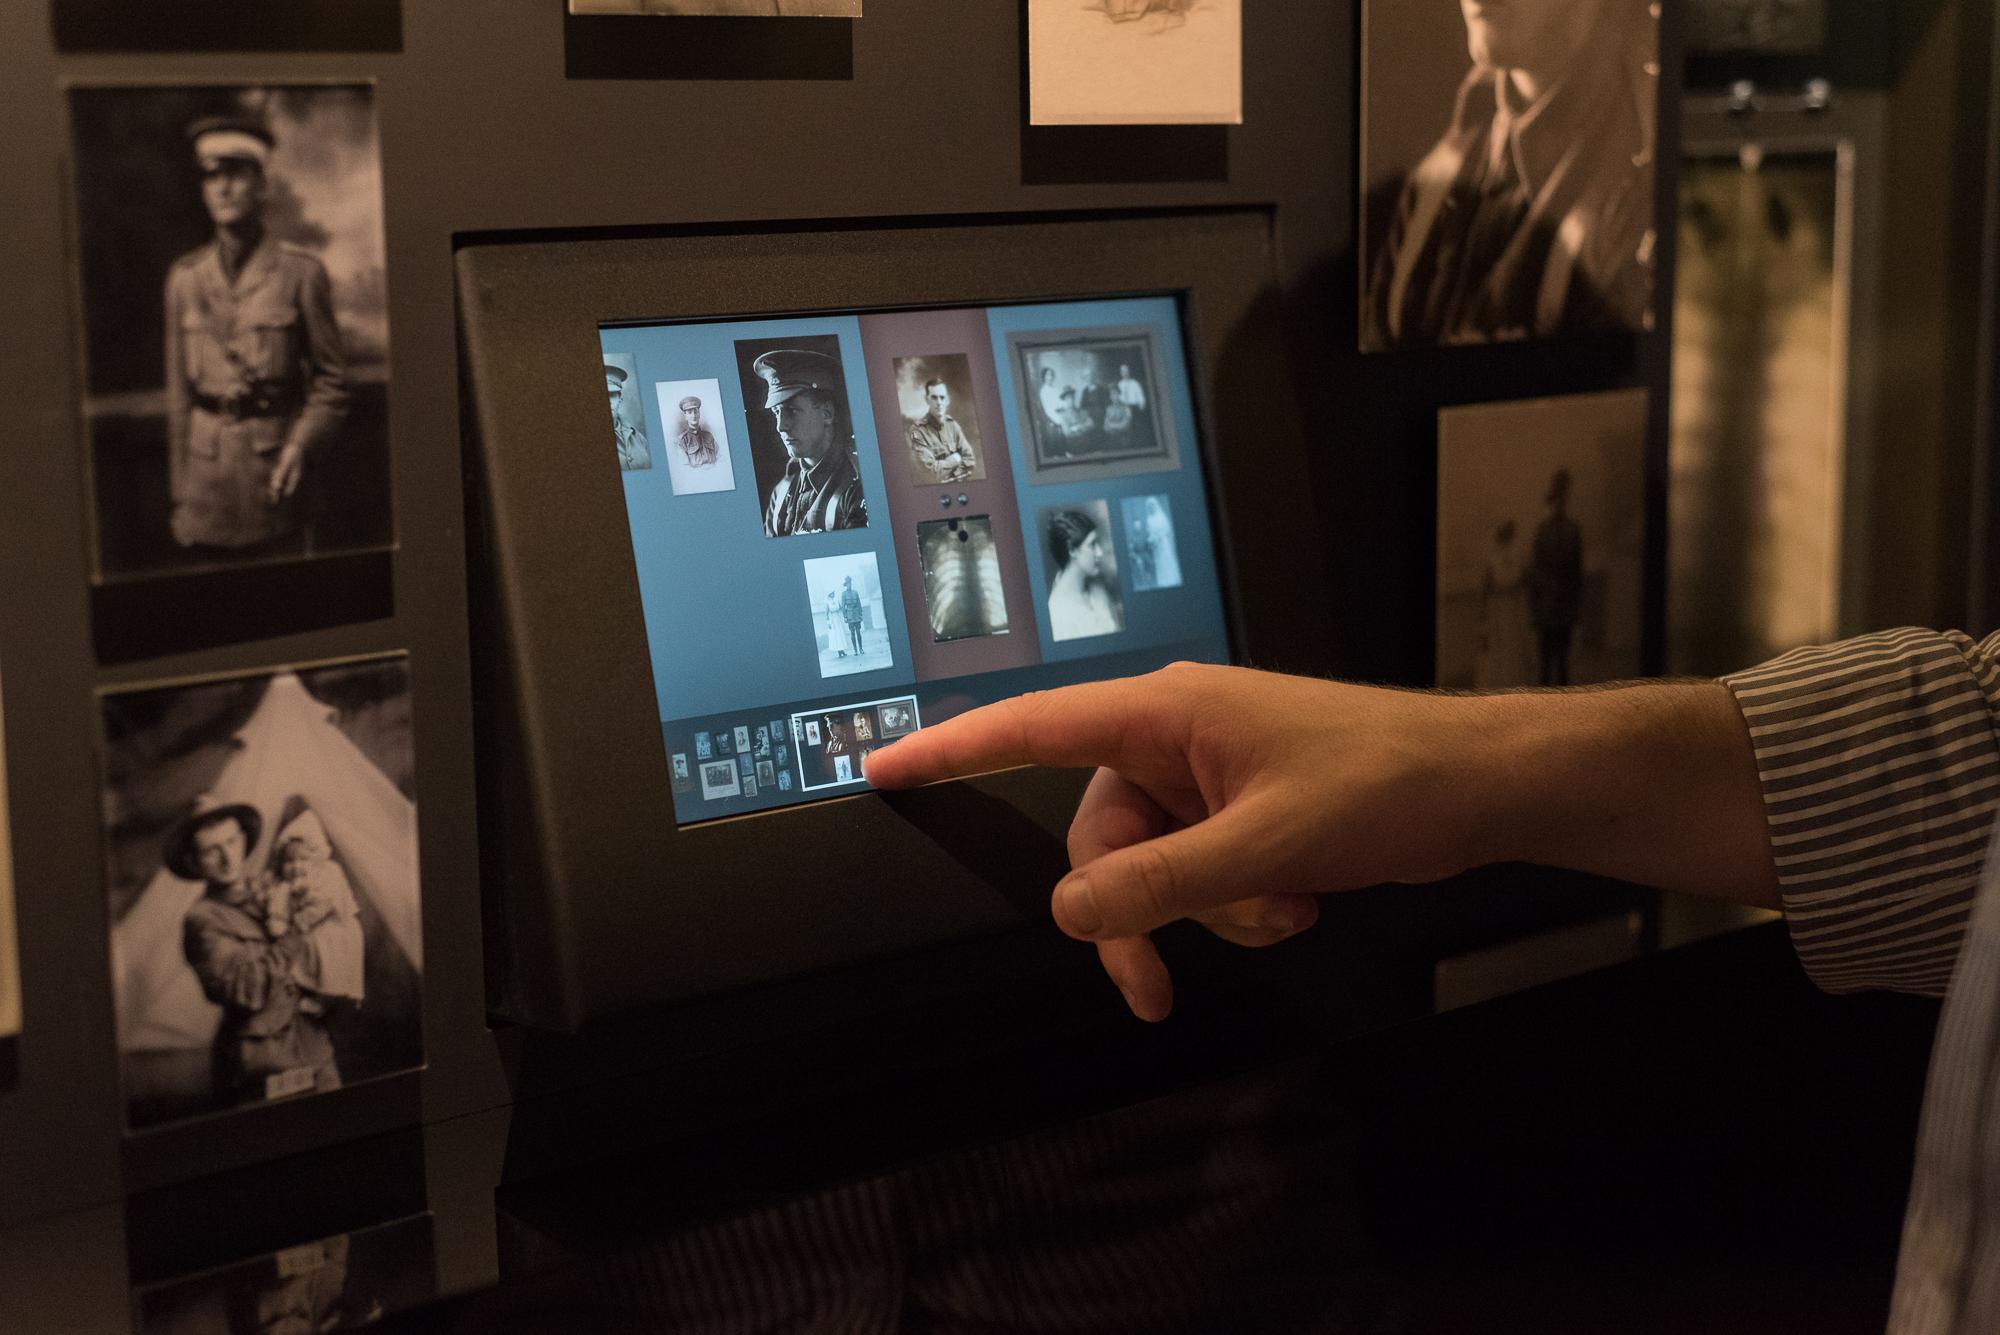 Interactive digital signage at the Australian War Memorial